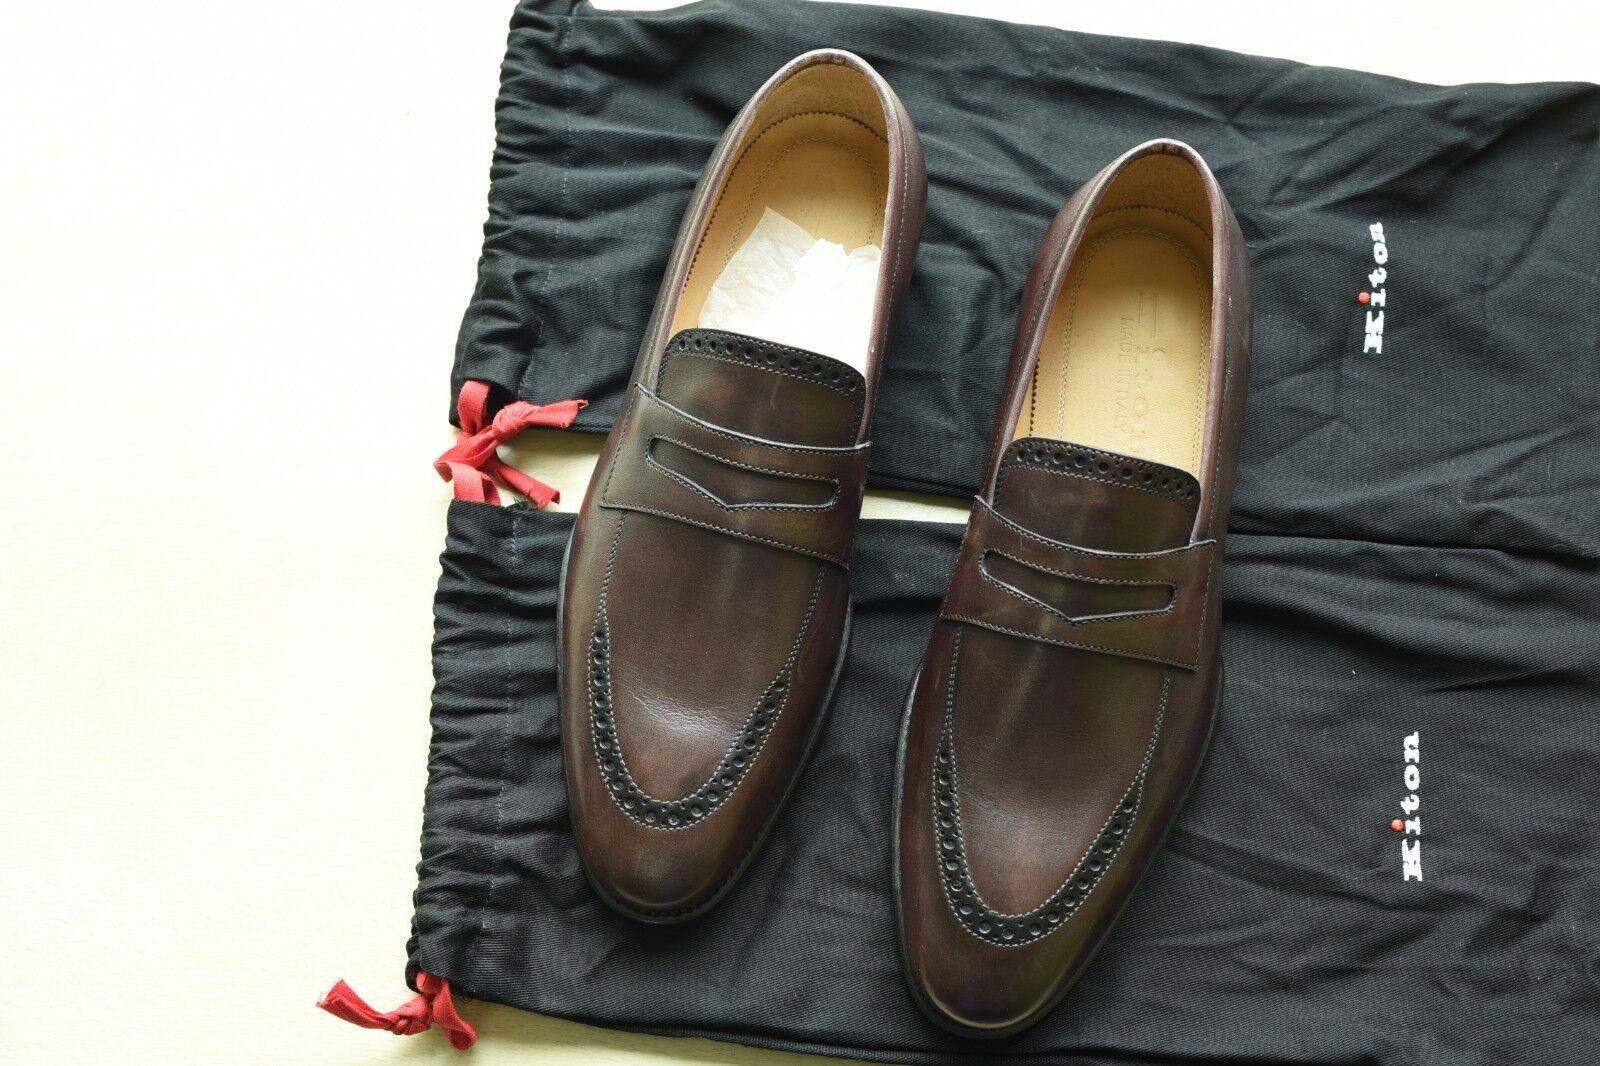 NIB Kiton Napoli penney loafer 6